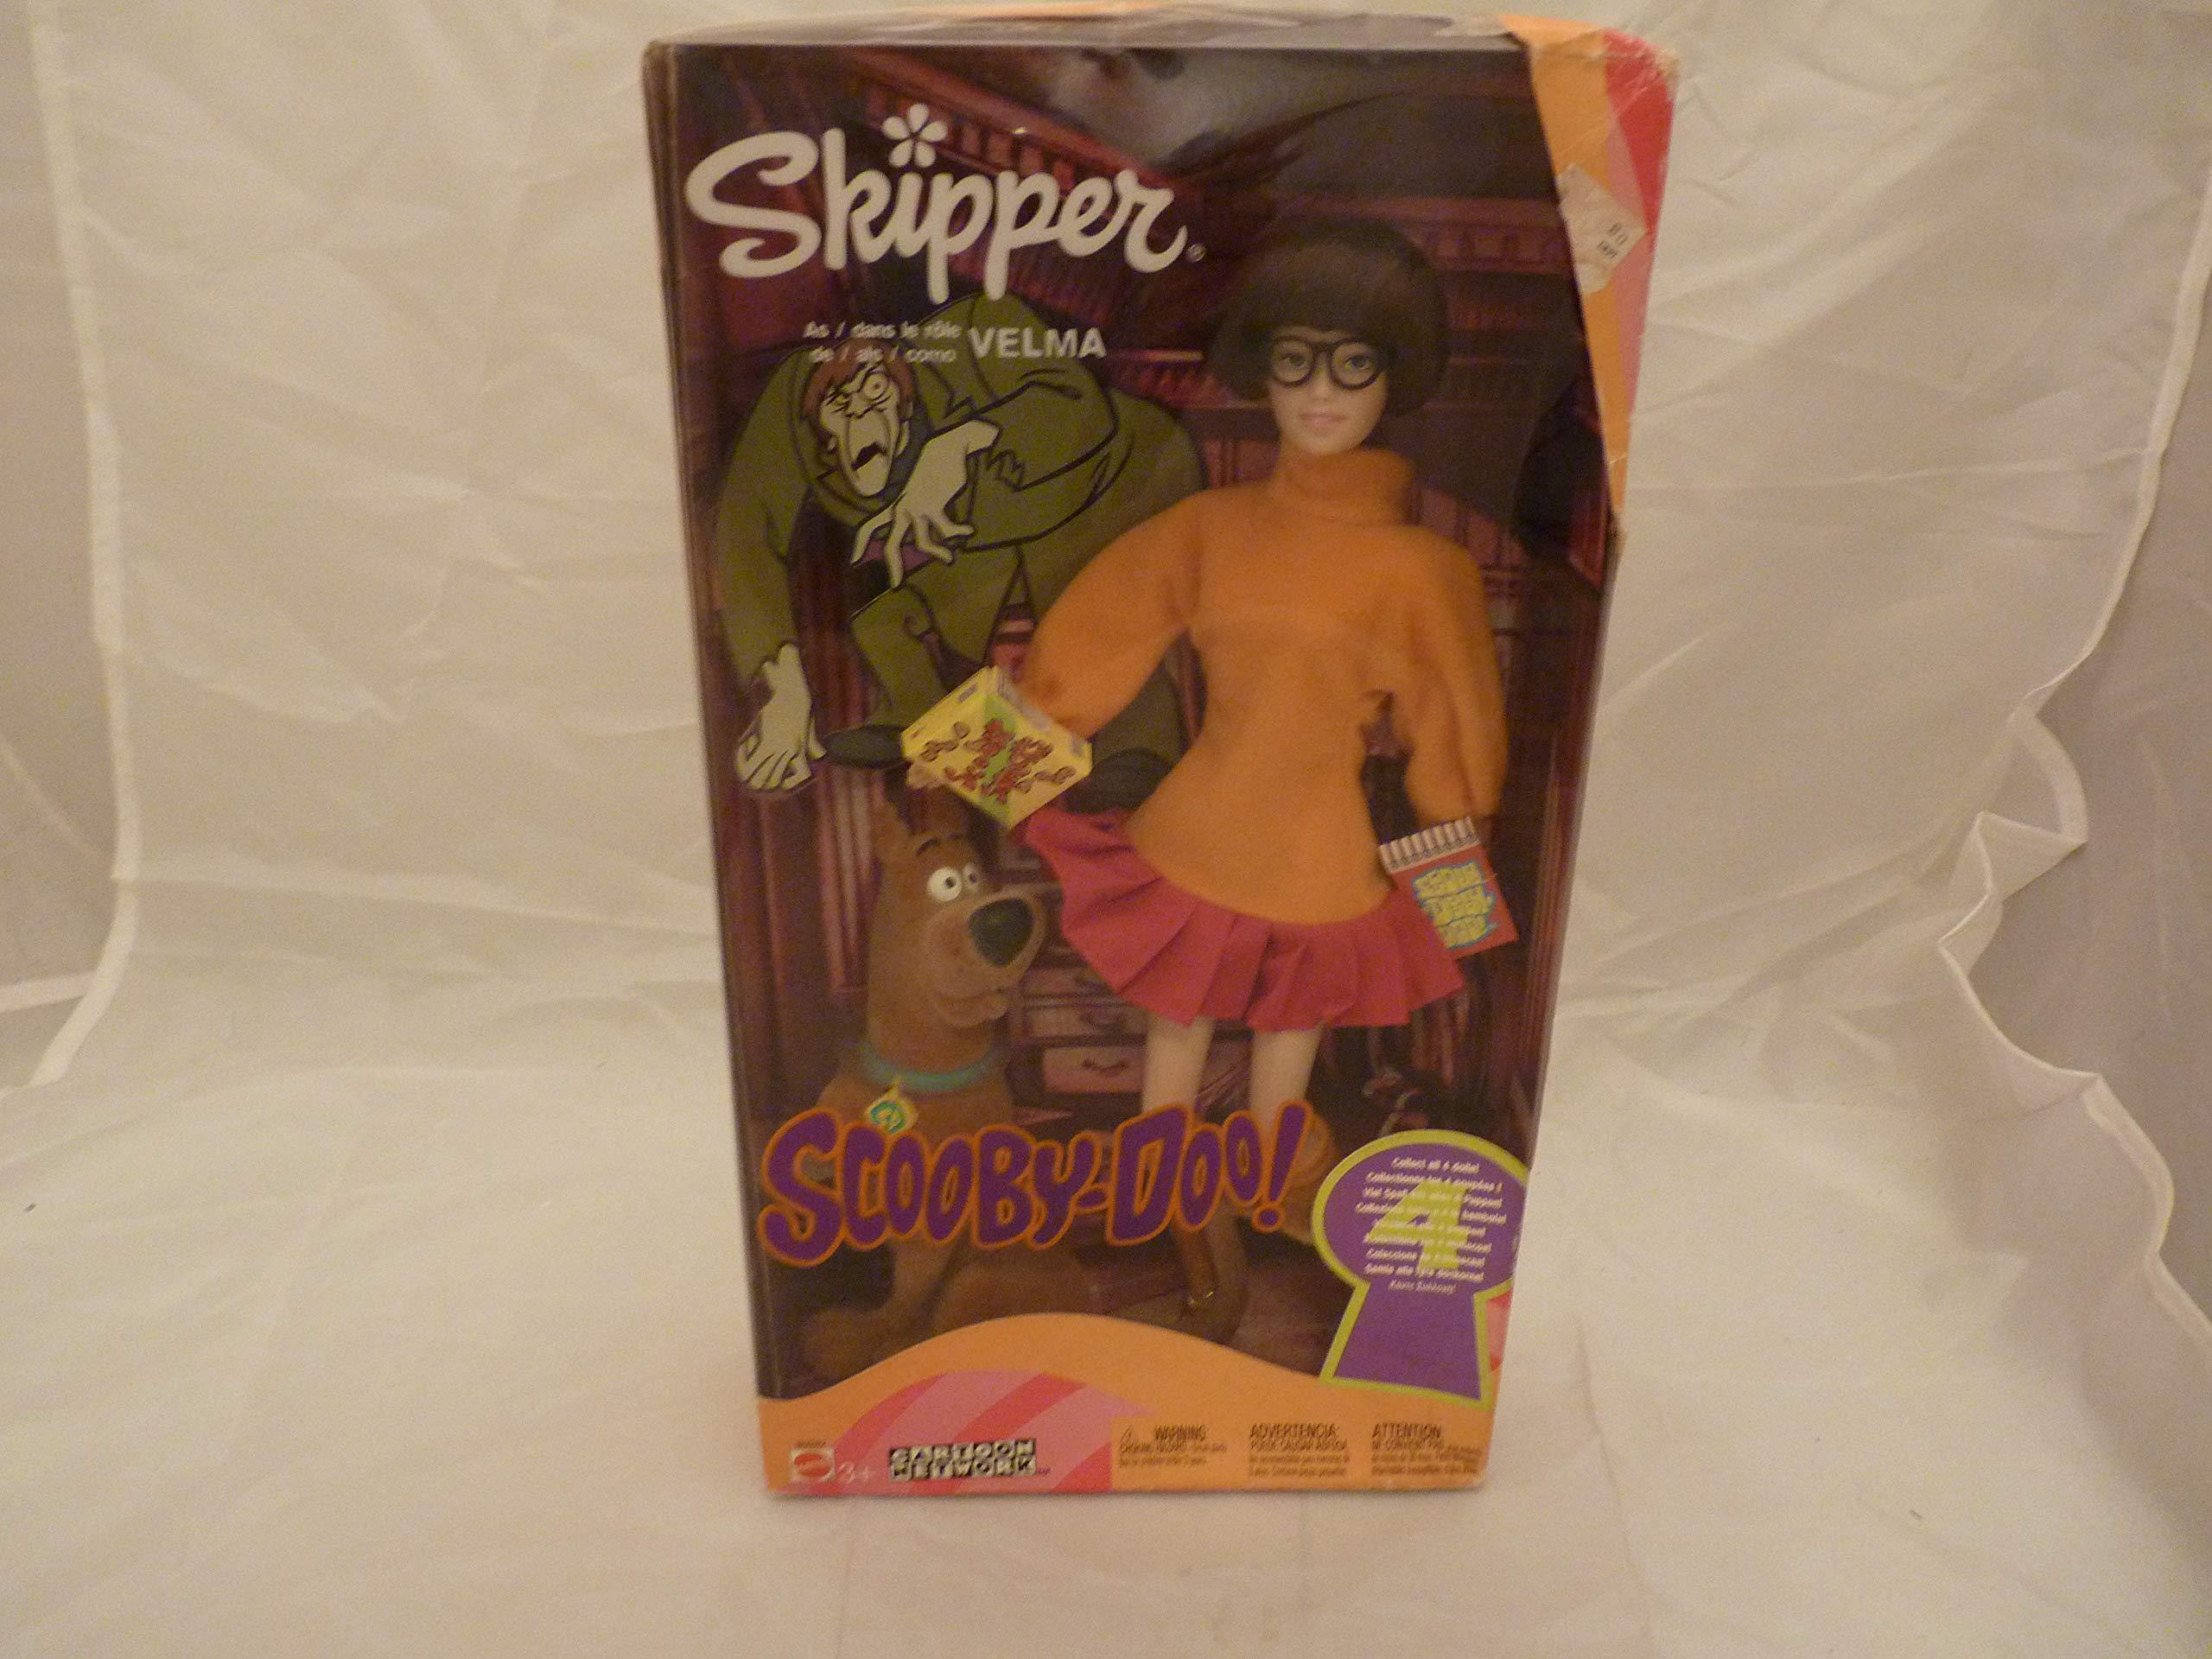 Skipper Barbie Doll as Velma from Scooby-Doo